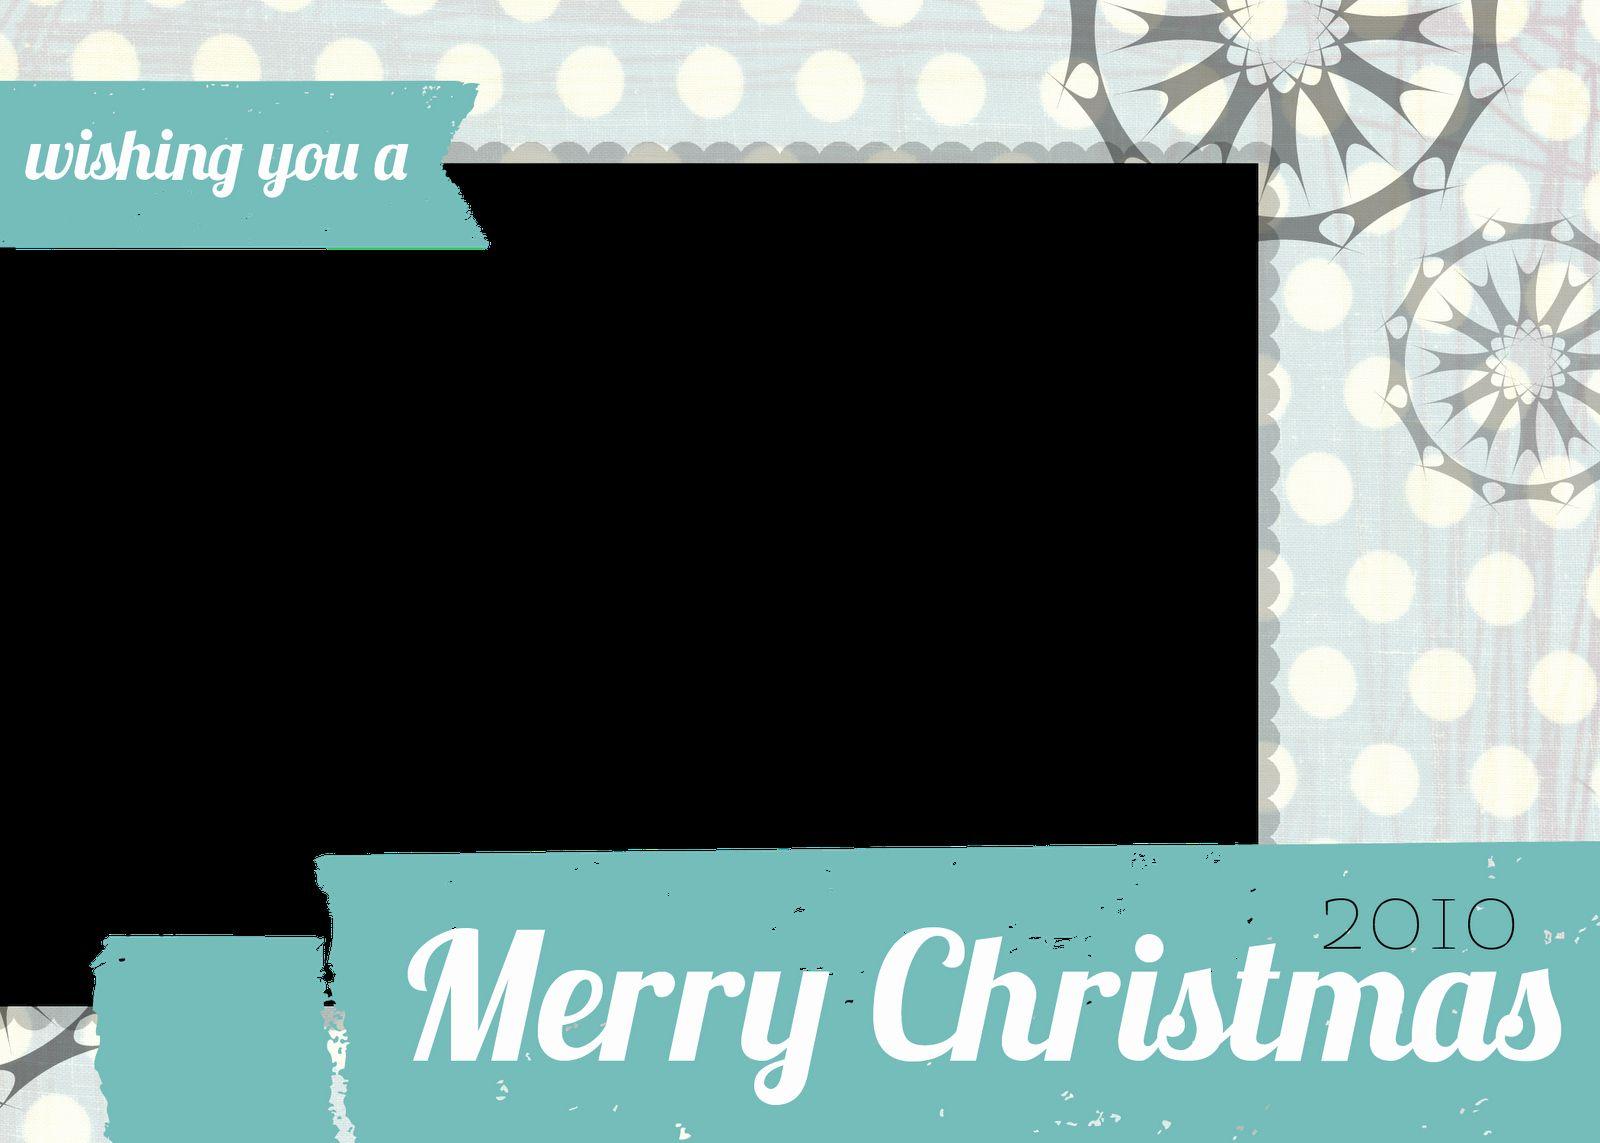 Free Photo Christmas Card Templates New Christmas Cards Templates 3 In 2020 Free Holiday Cards Holiday Card Template Greeting Card Template